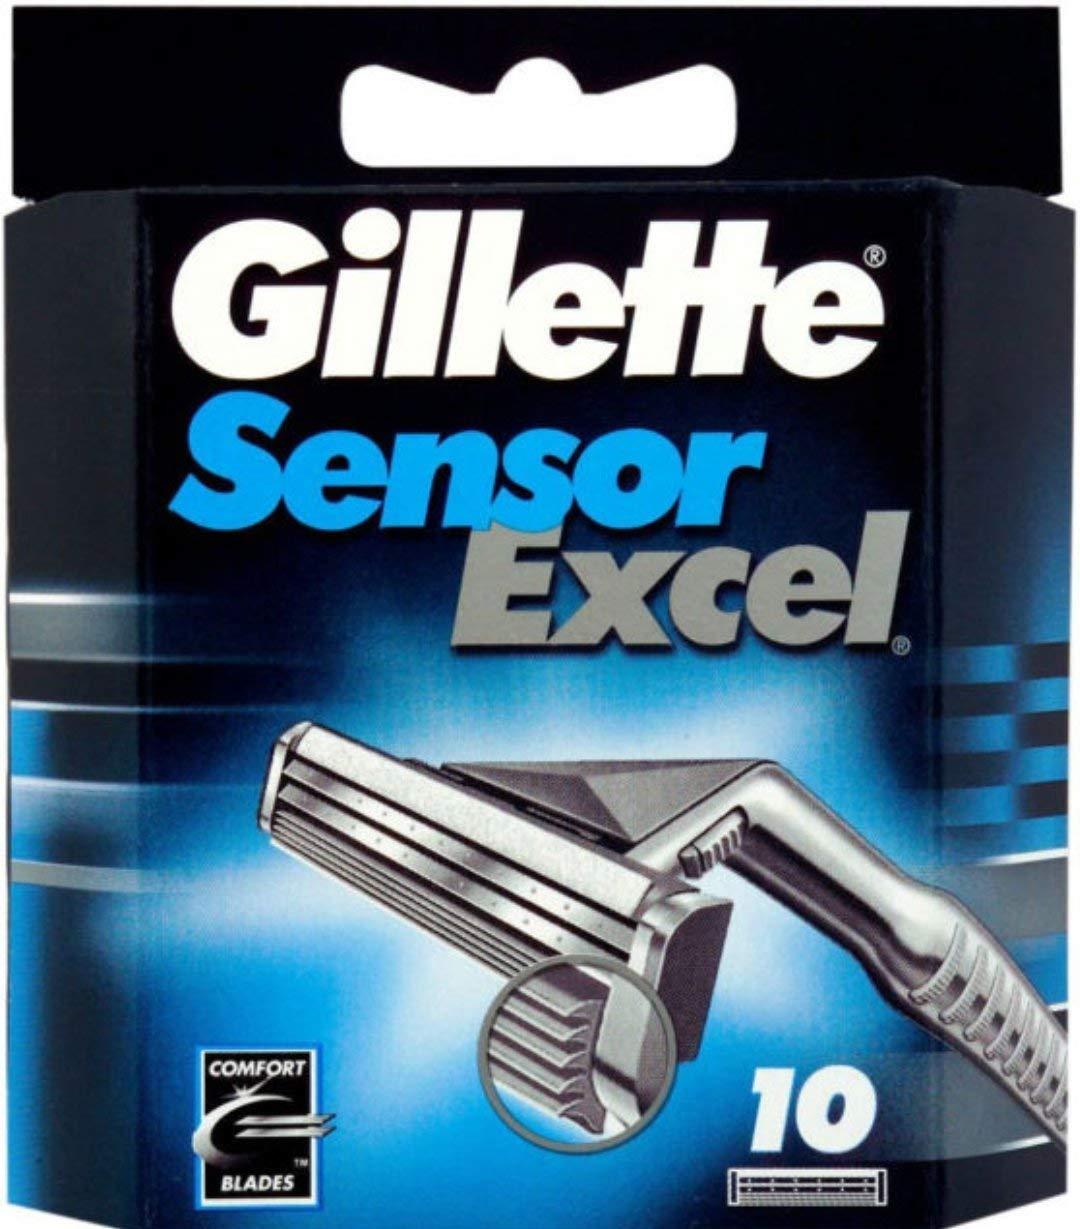 Gillett Sensor Excel Refill Blade Cartridges, 10 Ct.  (Packaging May Vary)